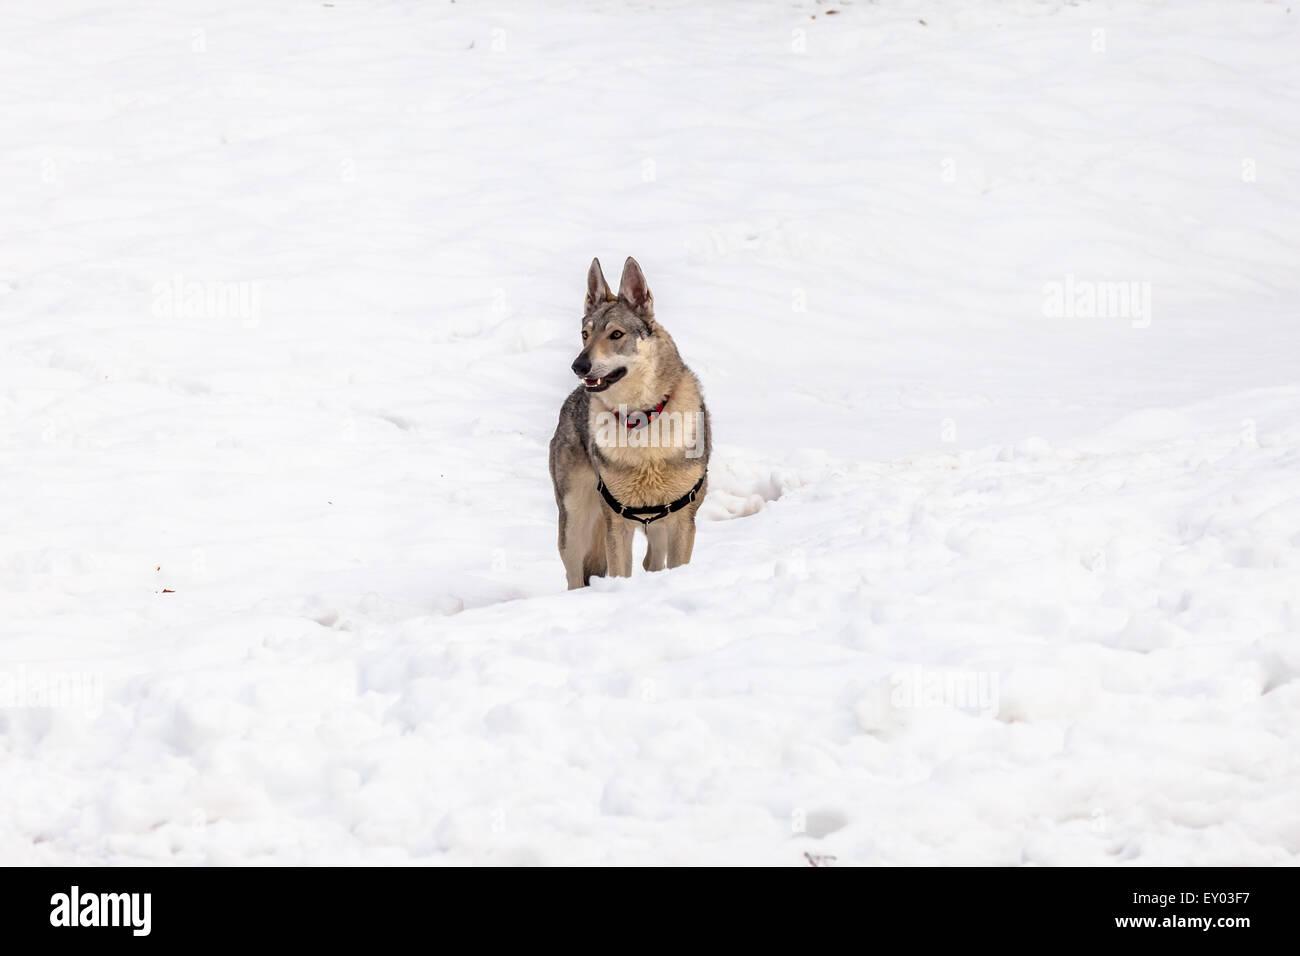 Czechoslovakian wolf dog - Stock Image